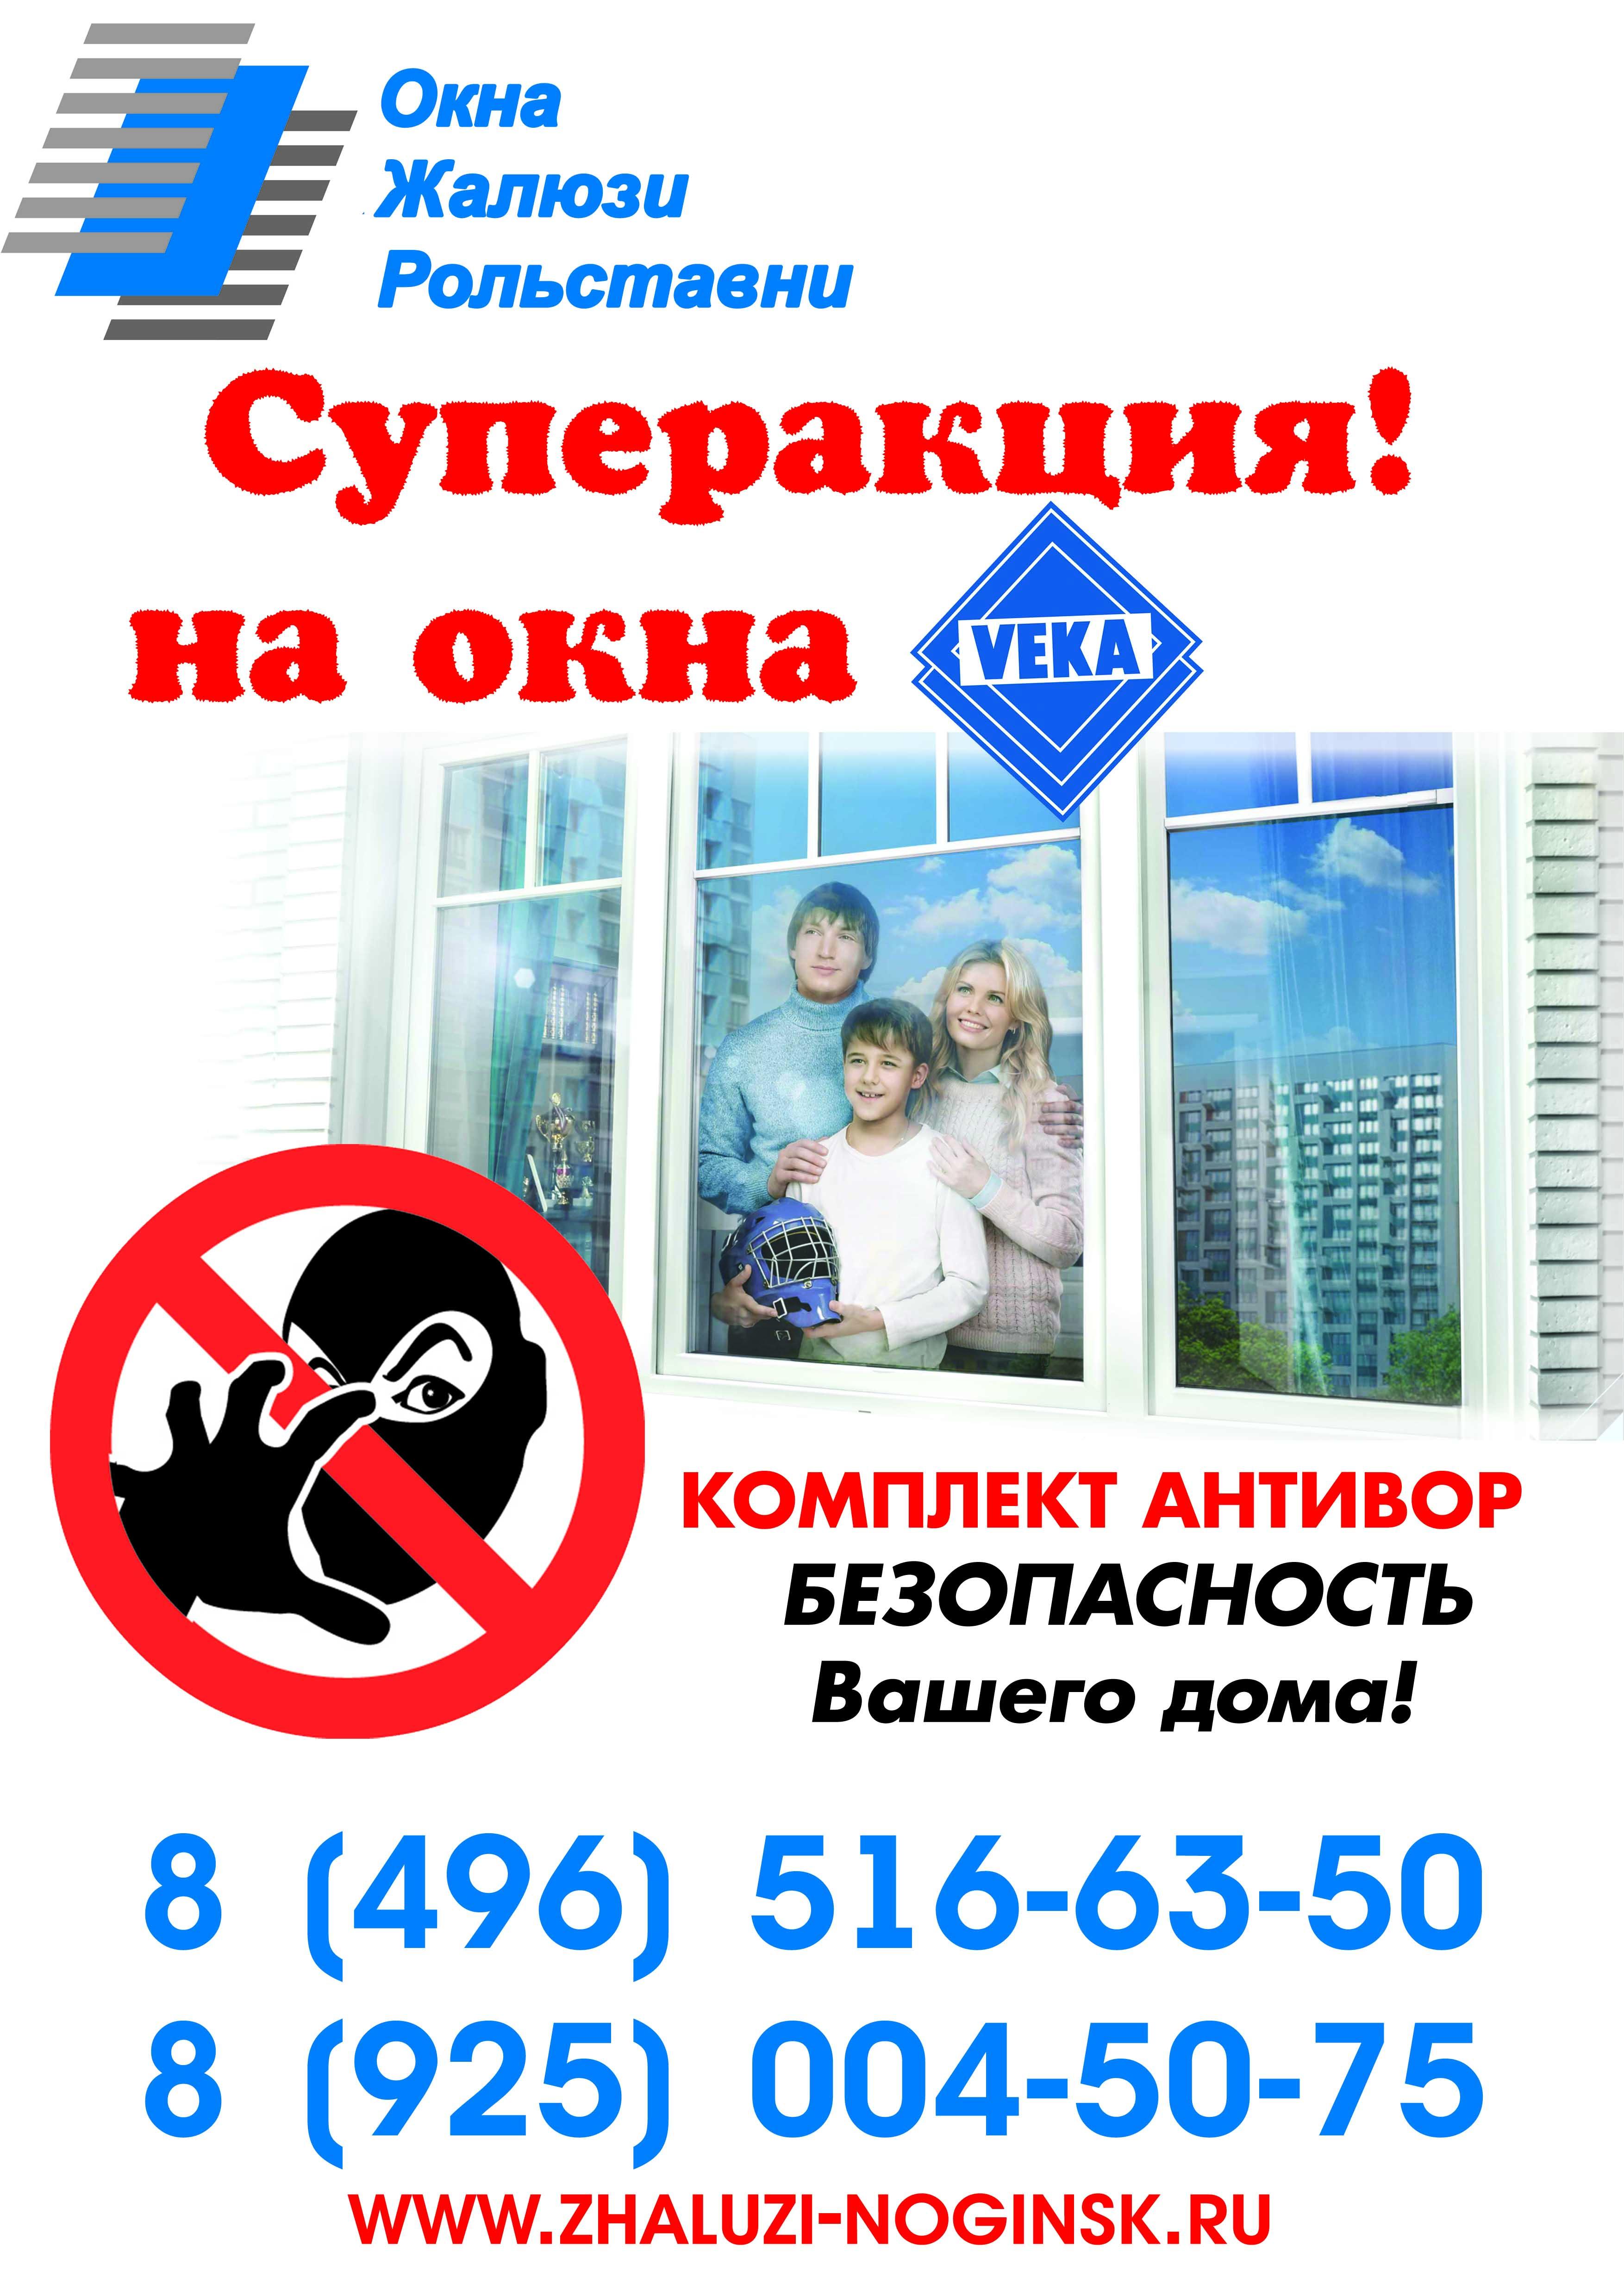 Акция: Комплект от Veka АНТИВОР – Ваш дом в надежных руках!